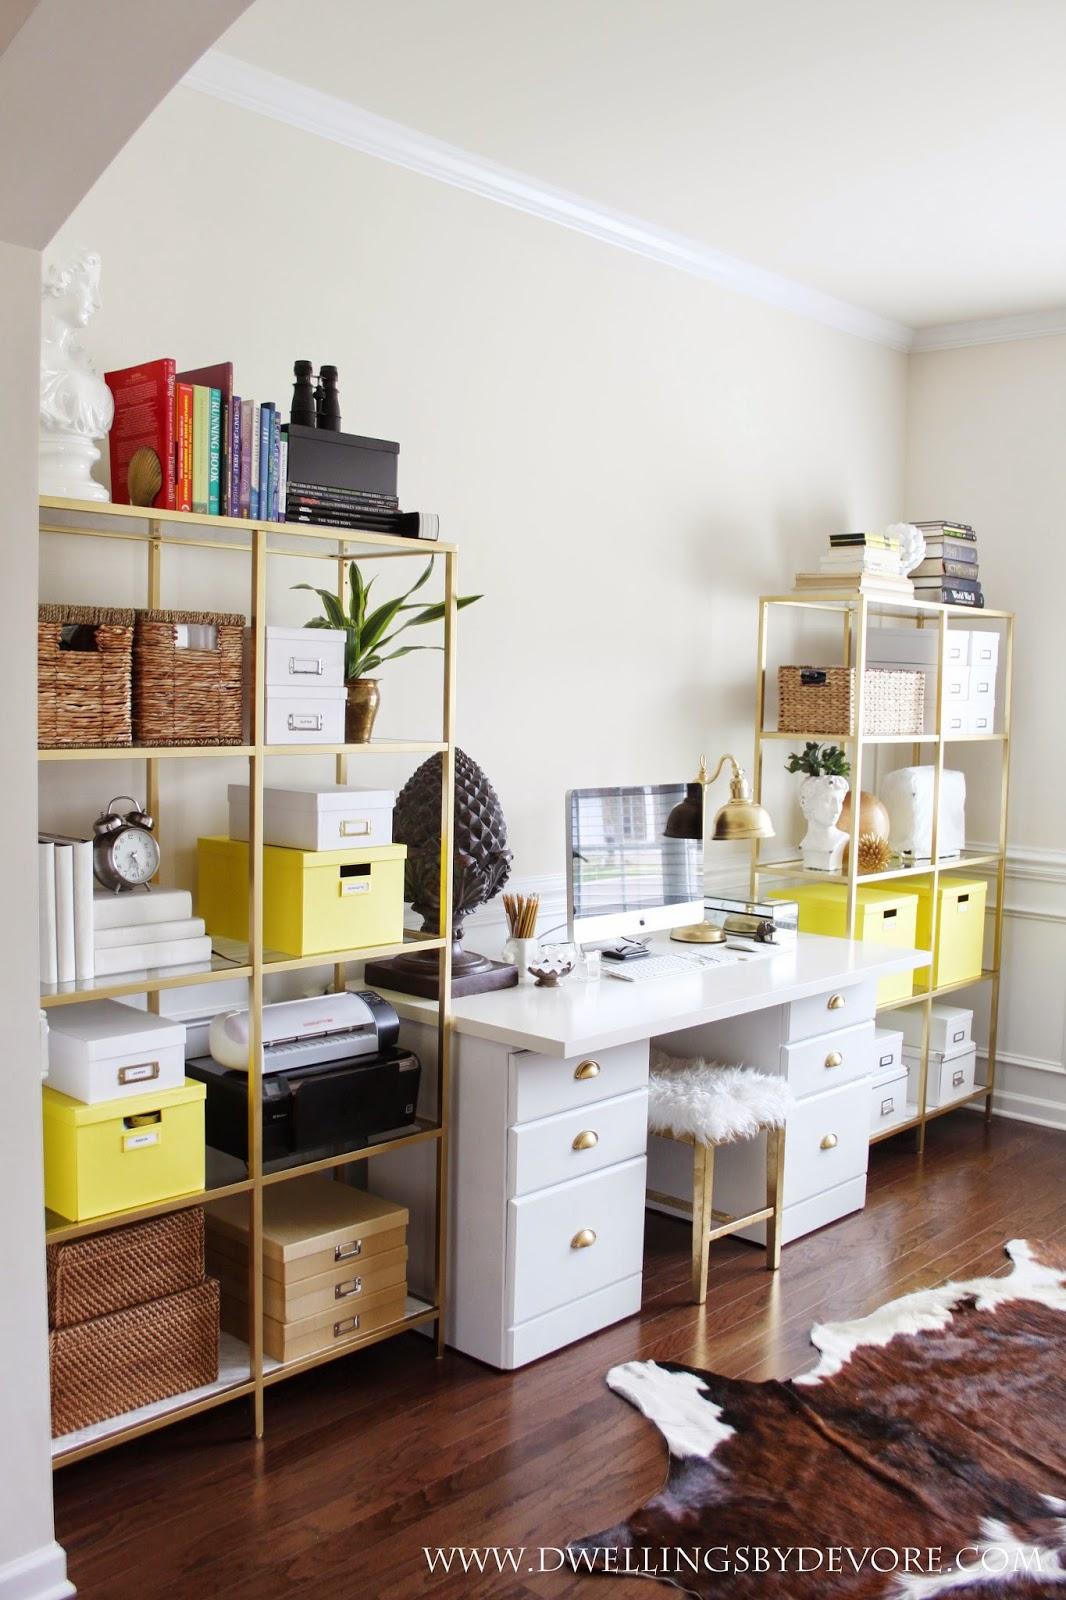 dwellings by devore ikea vittsjo hack. Black Bedroom Furniture Sets. Home Design Ideas